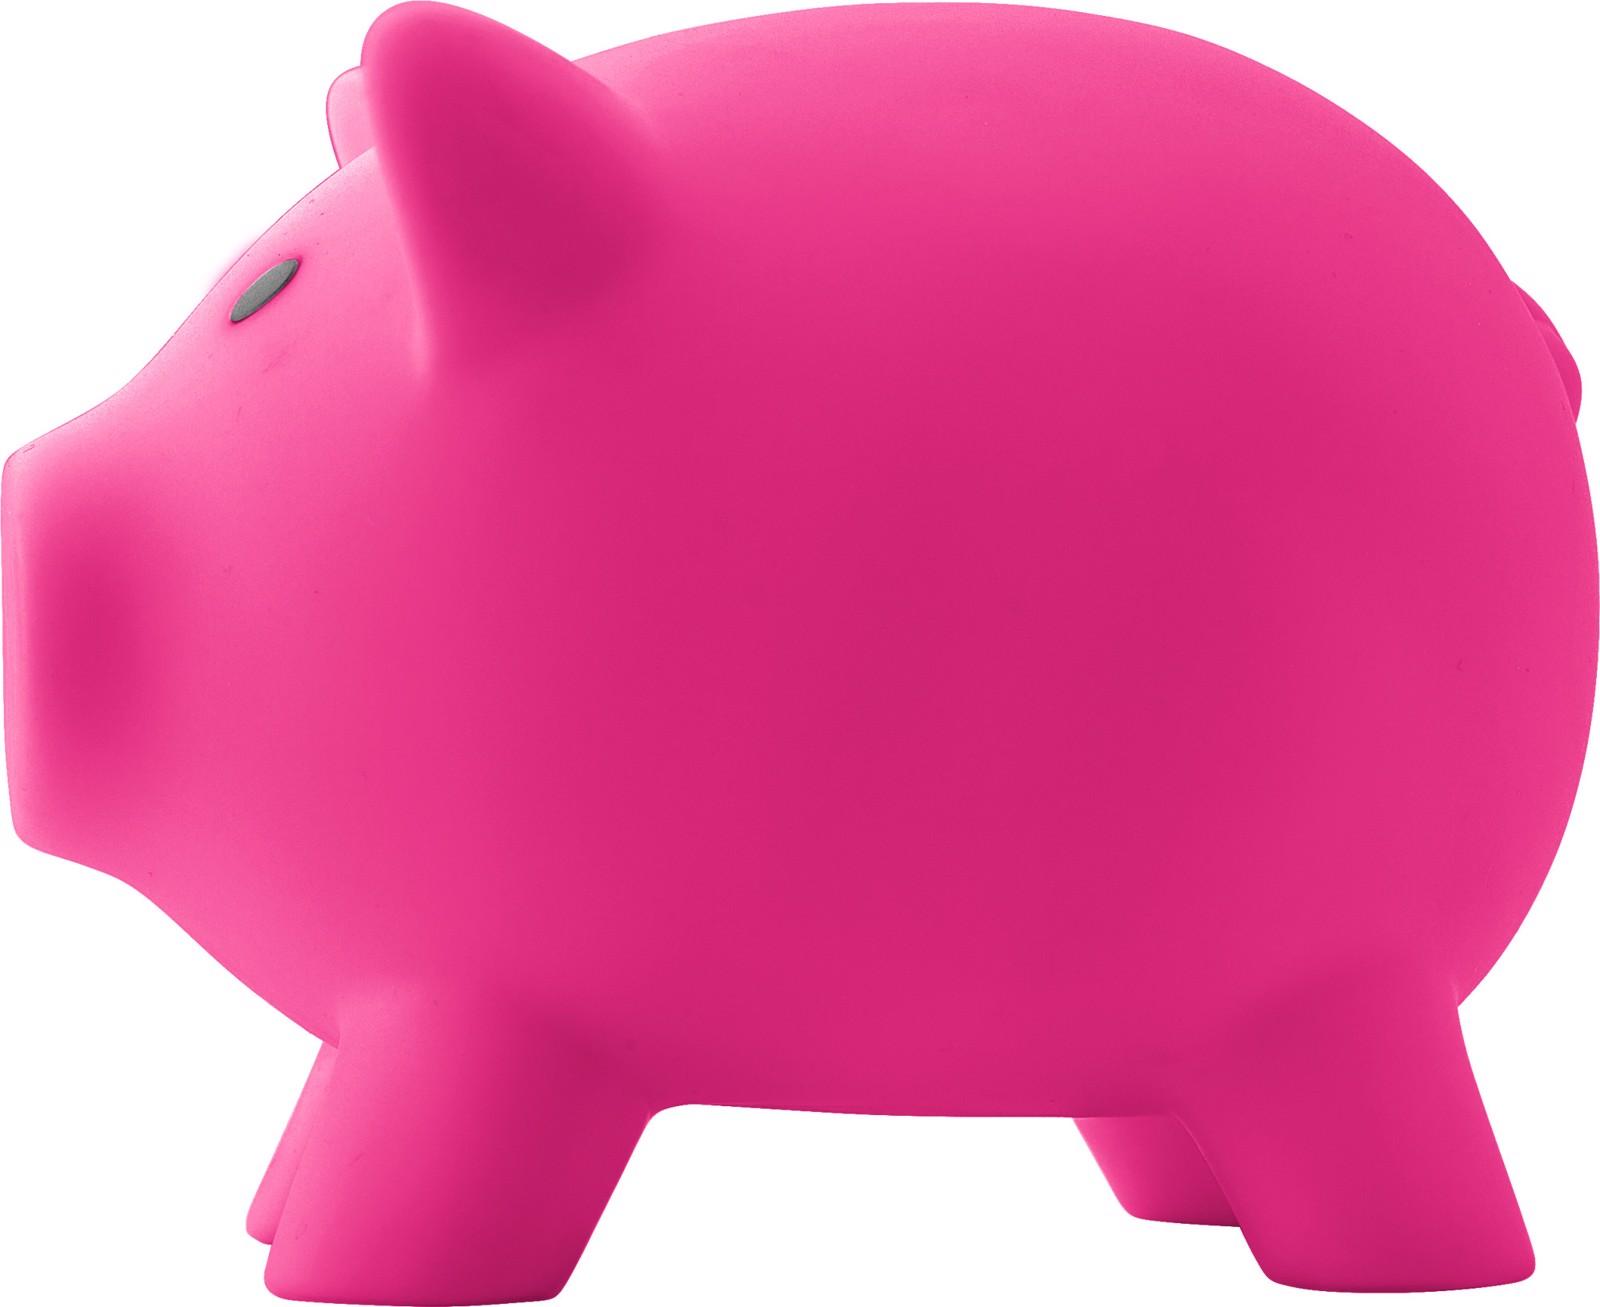 PVC piggy bank - Pink